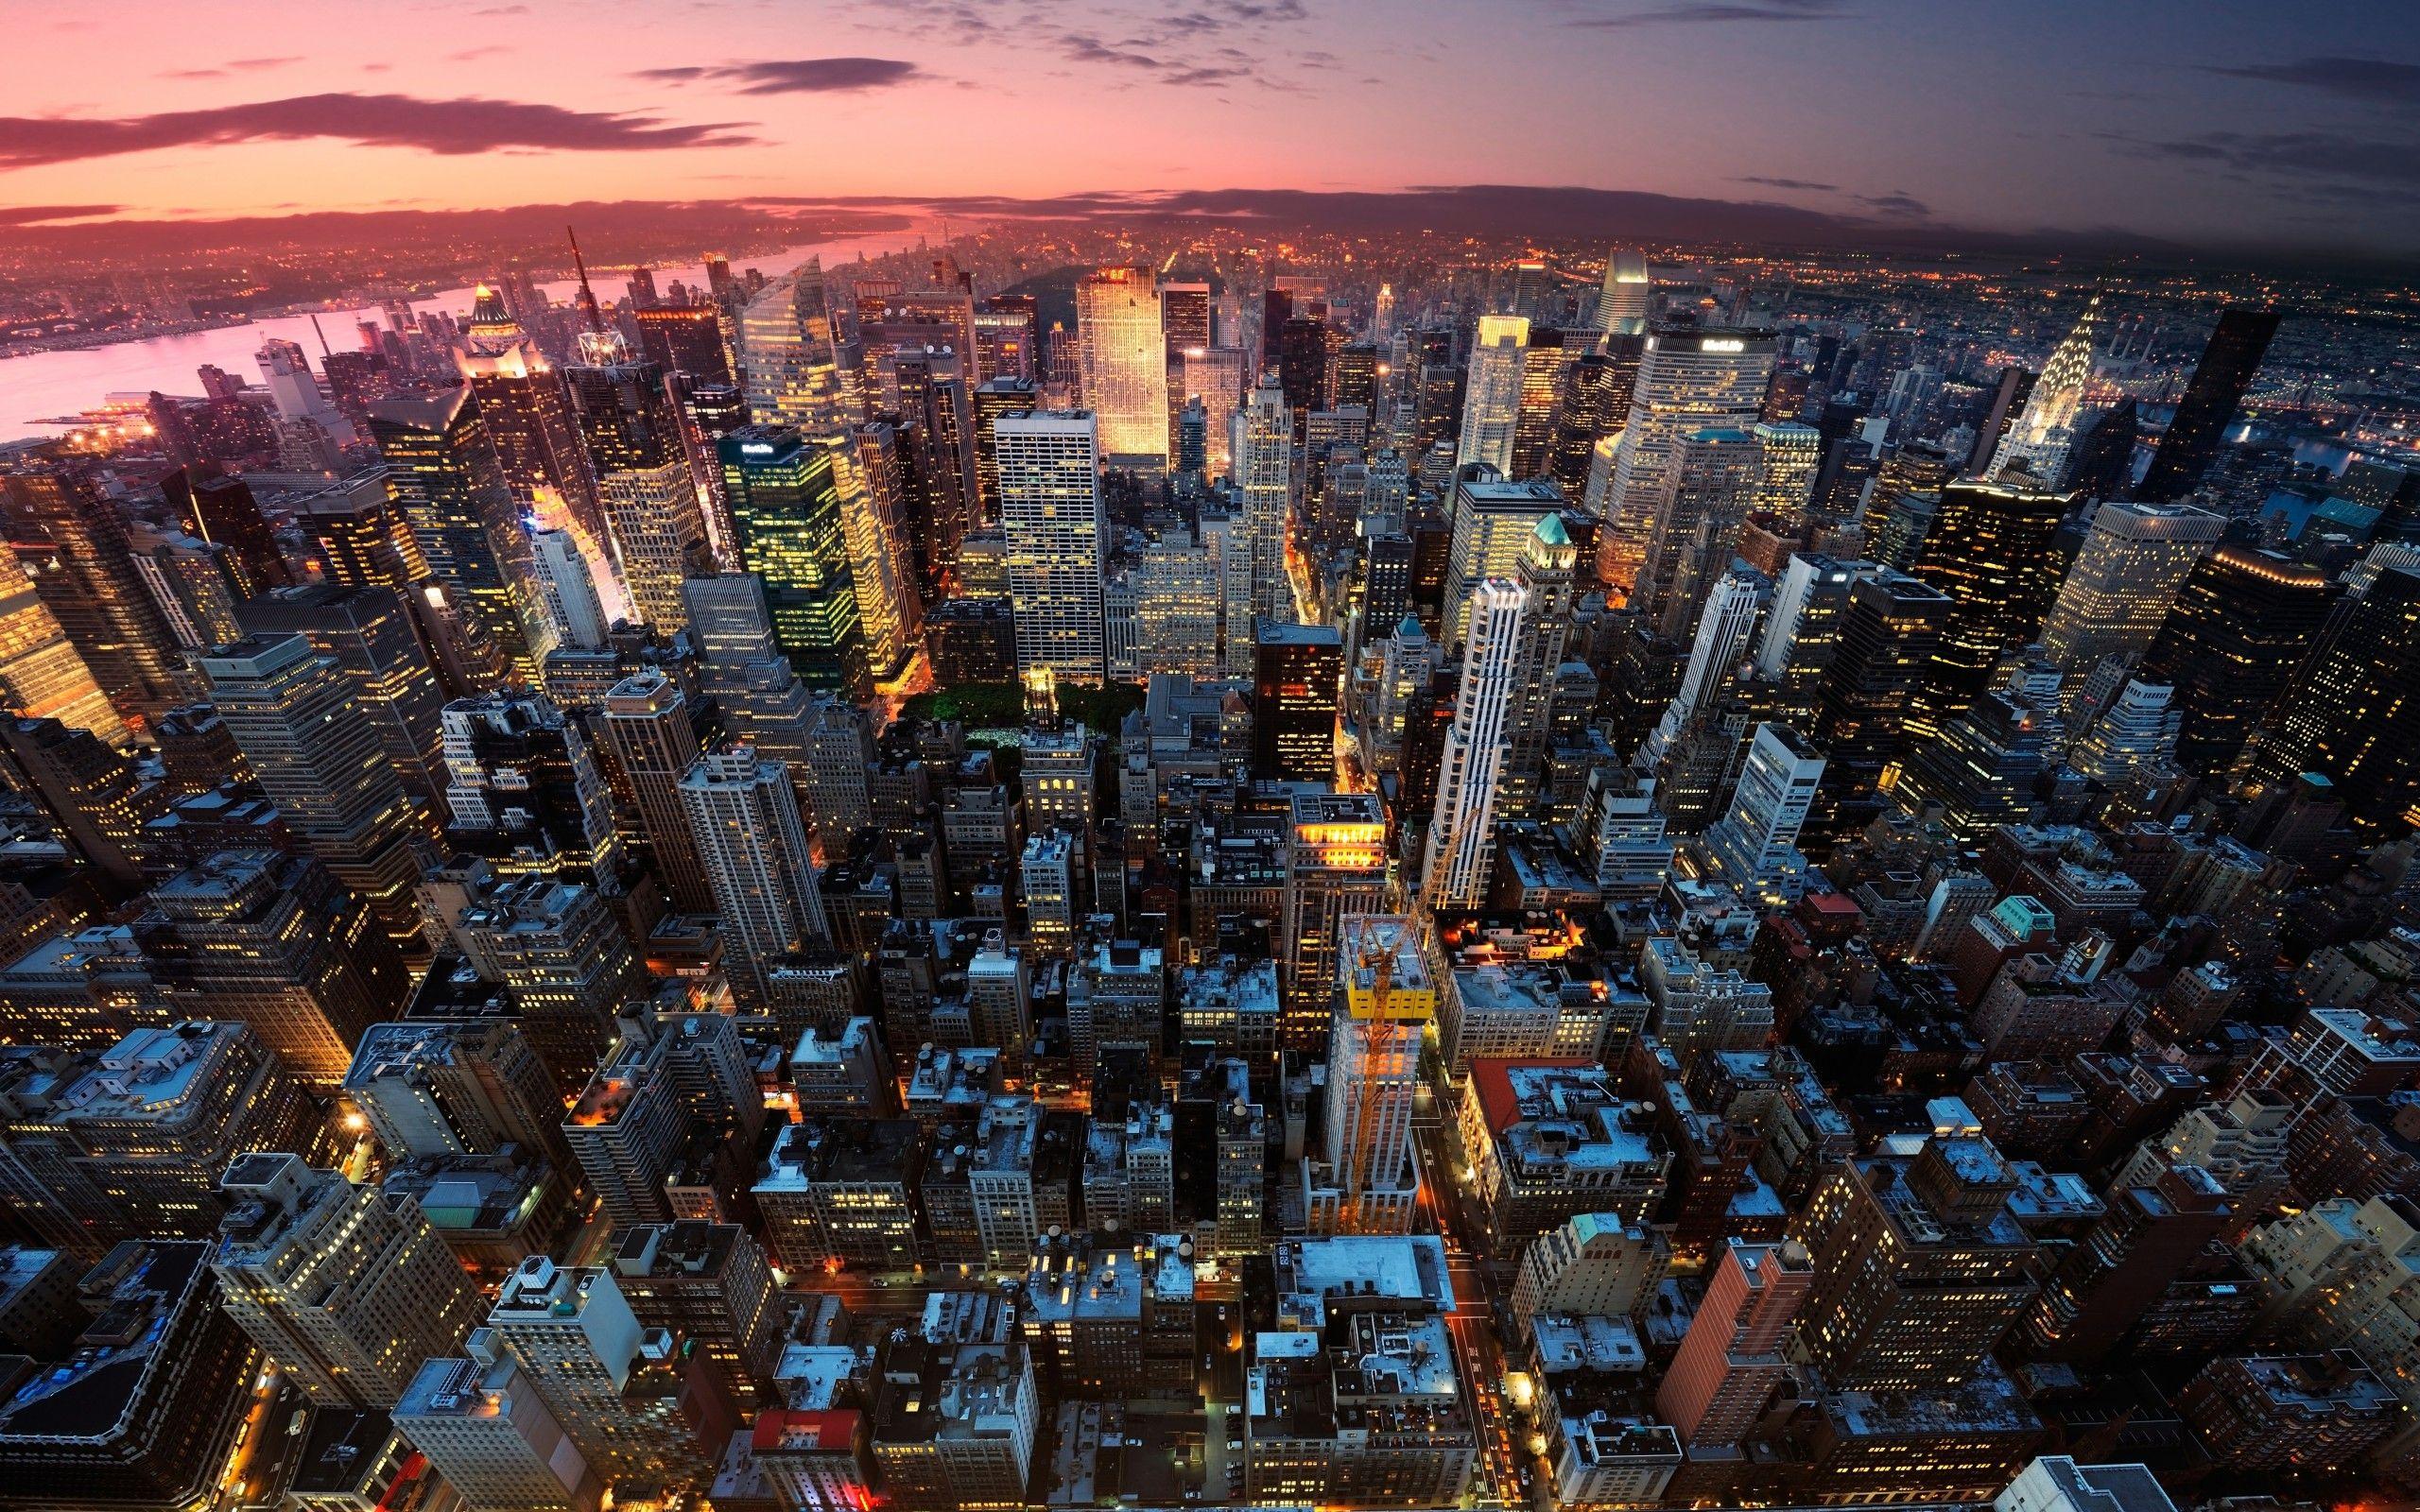 New York Manhattan Usa City Panorama Night Sunset Lights Light House Building Skyscraper Skys New York Wallpaper New York City Background Los Angeles Wallpaper